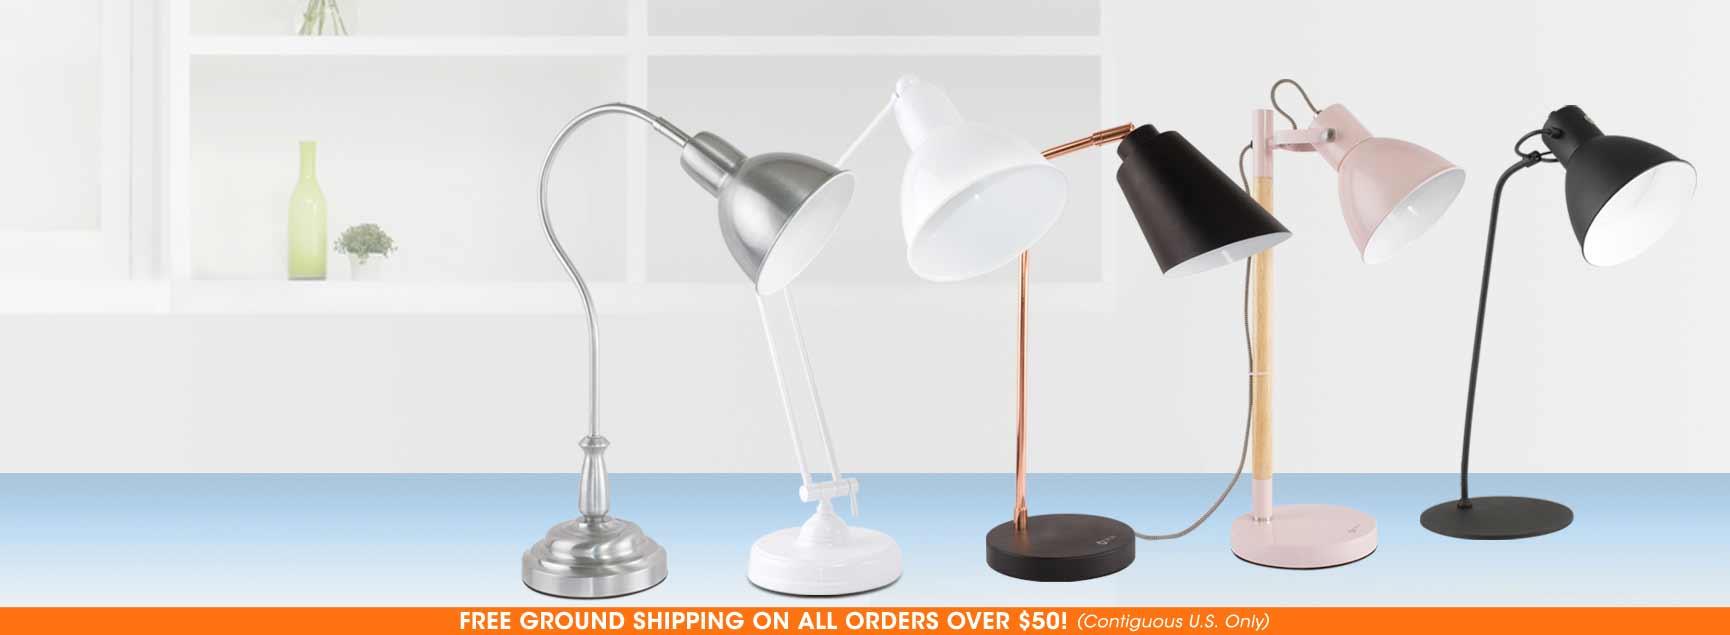 Ottlite Decorative Lighting Natural Daylight Decorative